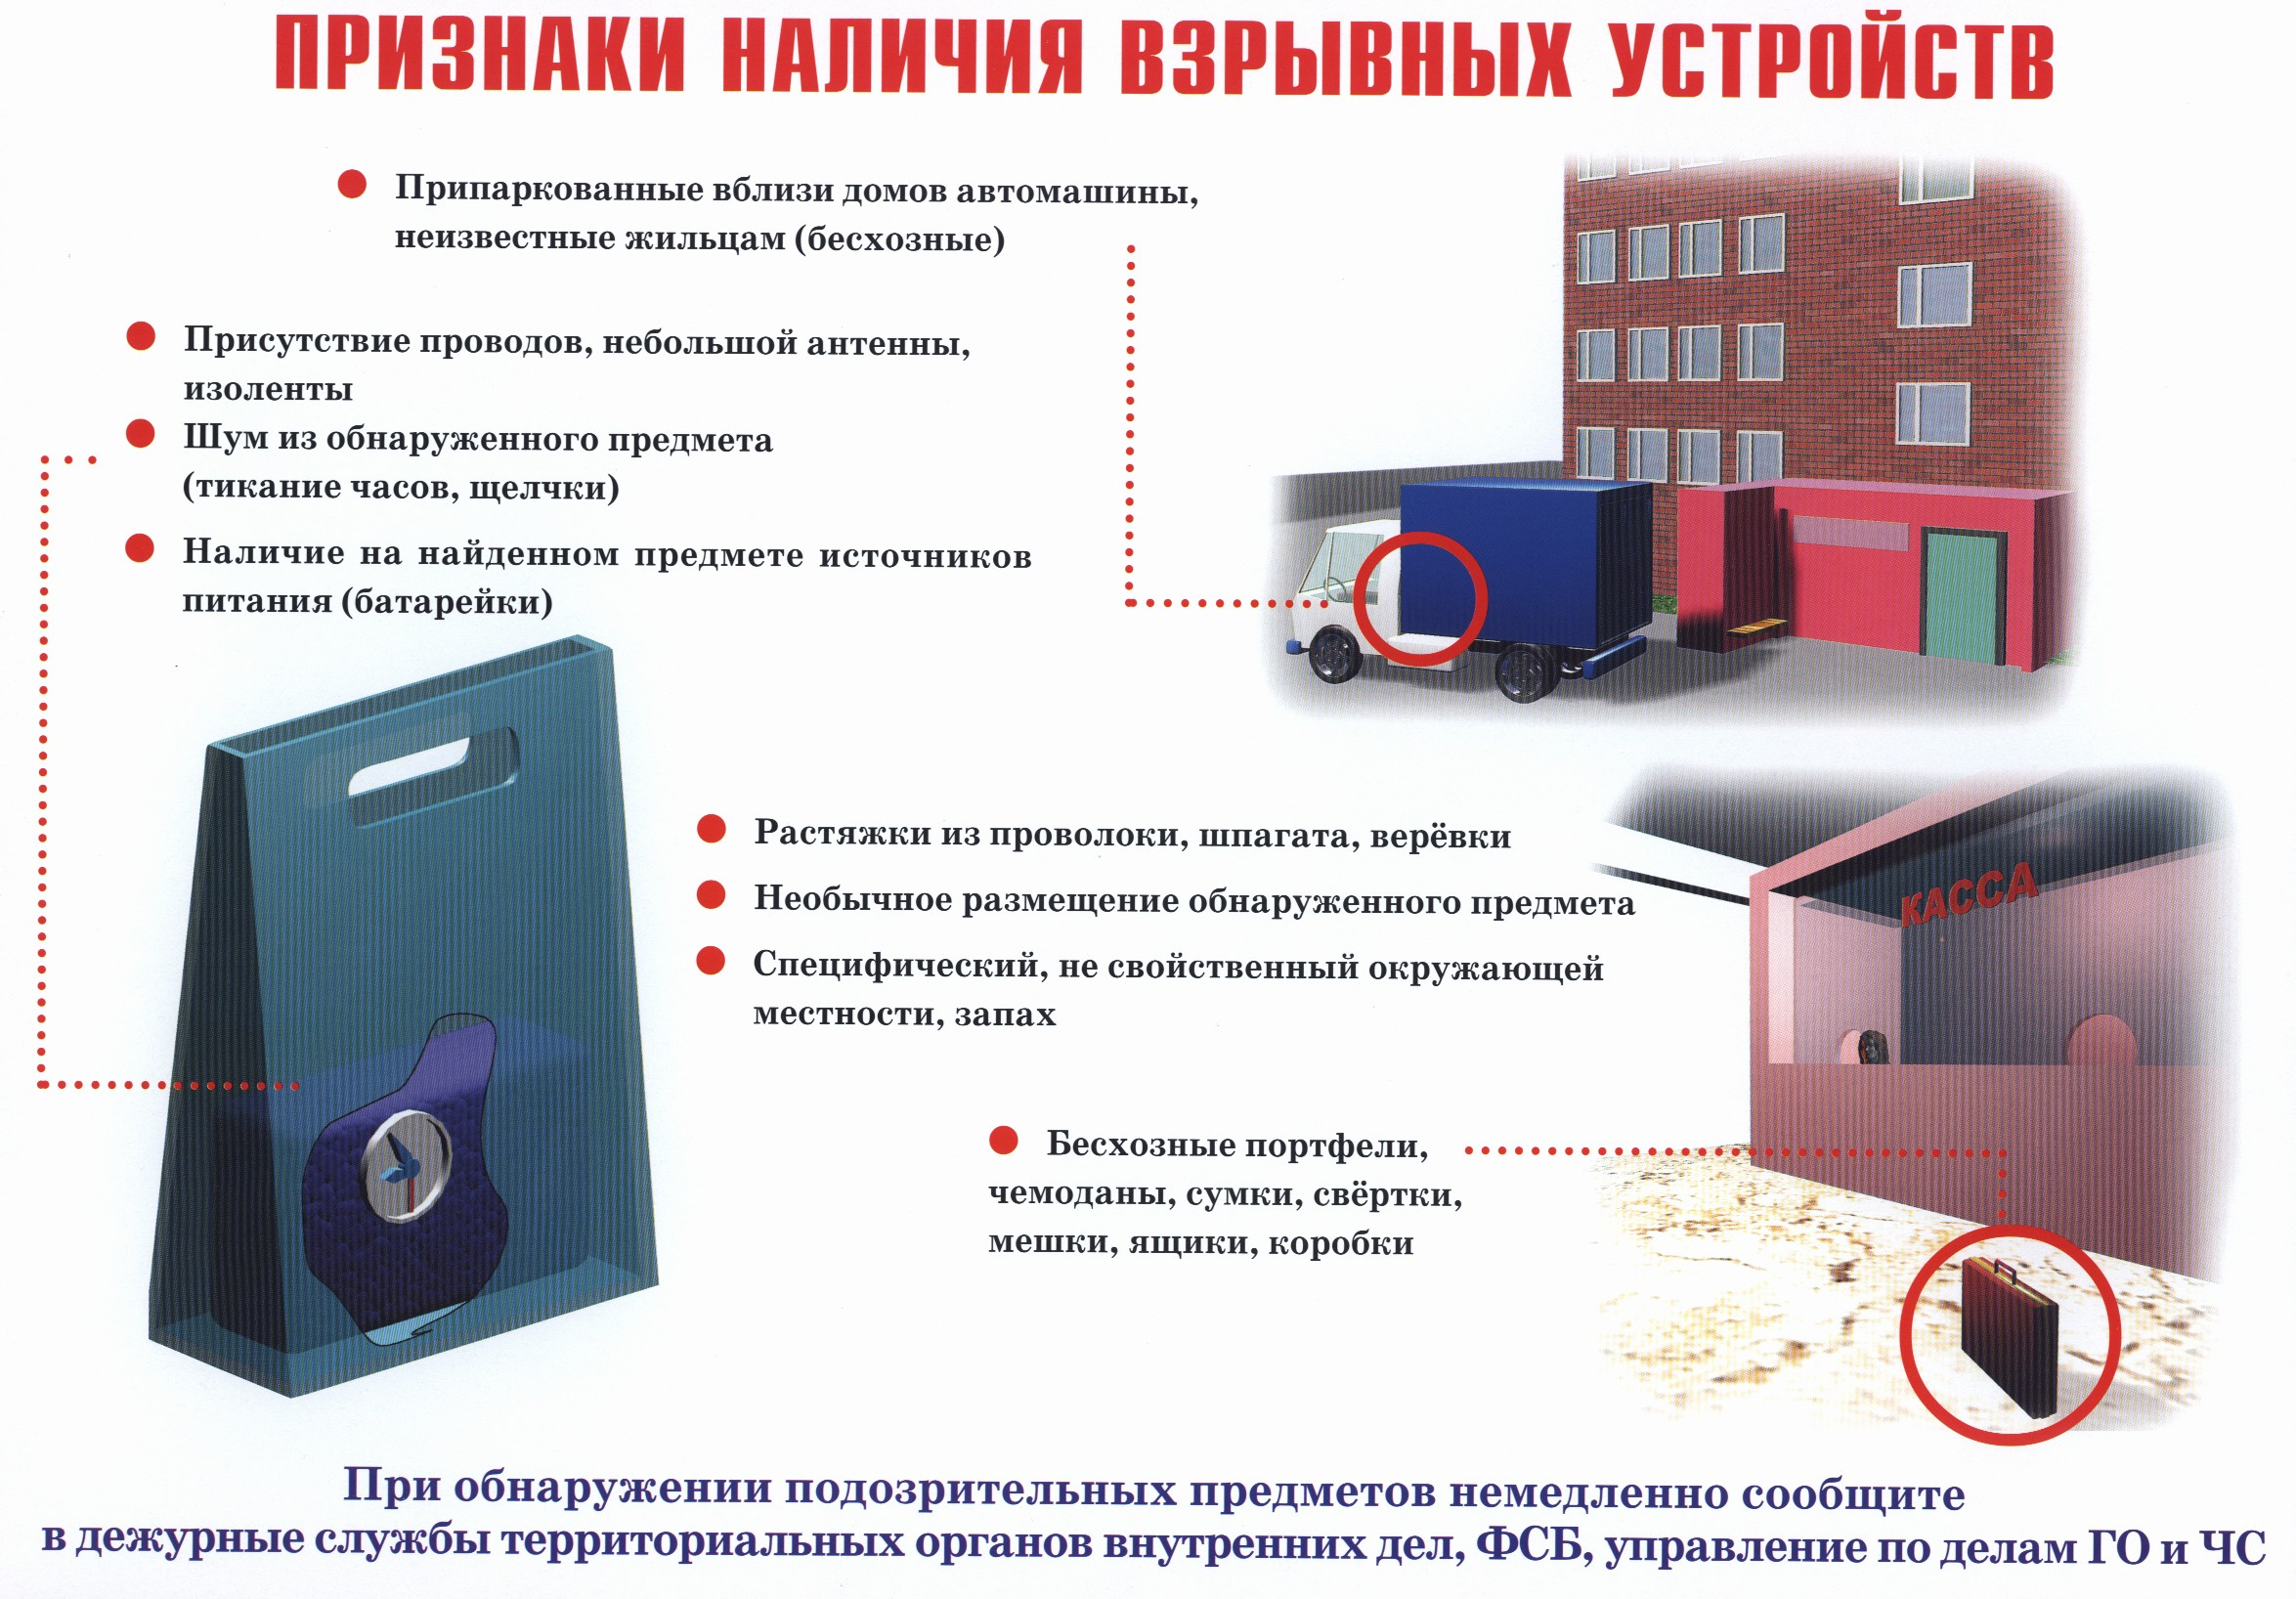 http://detsad-60.caduk.ru/images/p43_3.jpg